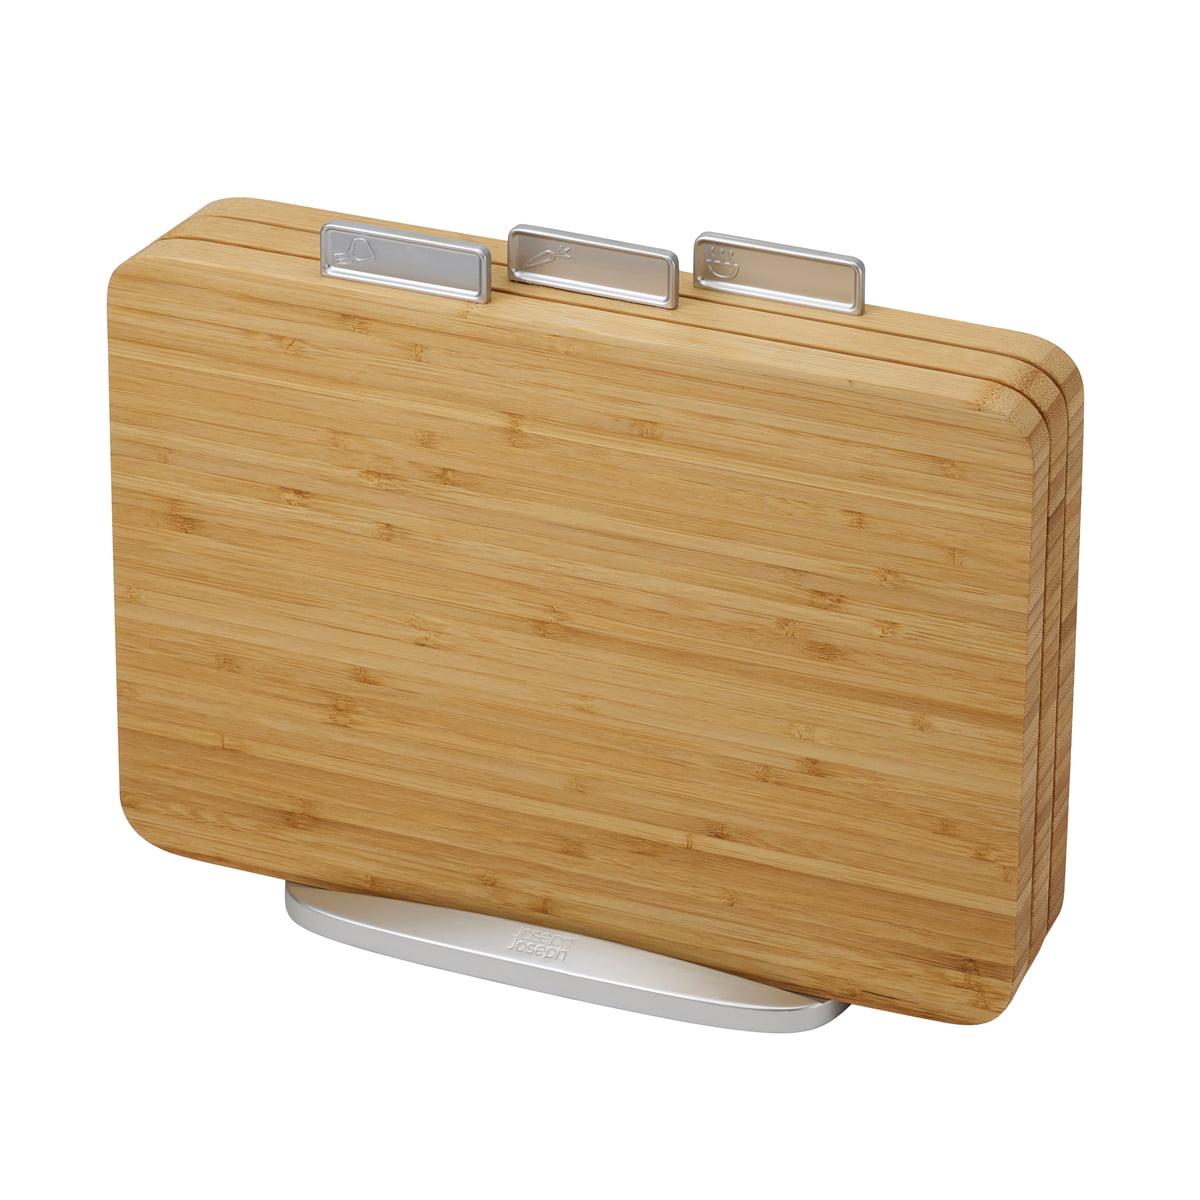 Joseph Joseph - Index Bamboo Schneidebretter (3er-Set) | Küche und Esszimmer > Kochen und Backen | Bambus natur | Bambusholz -  tpr -  pp | Joseph Joseph